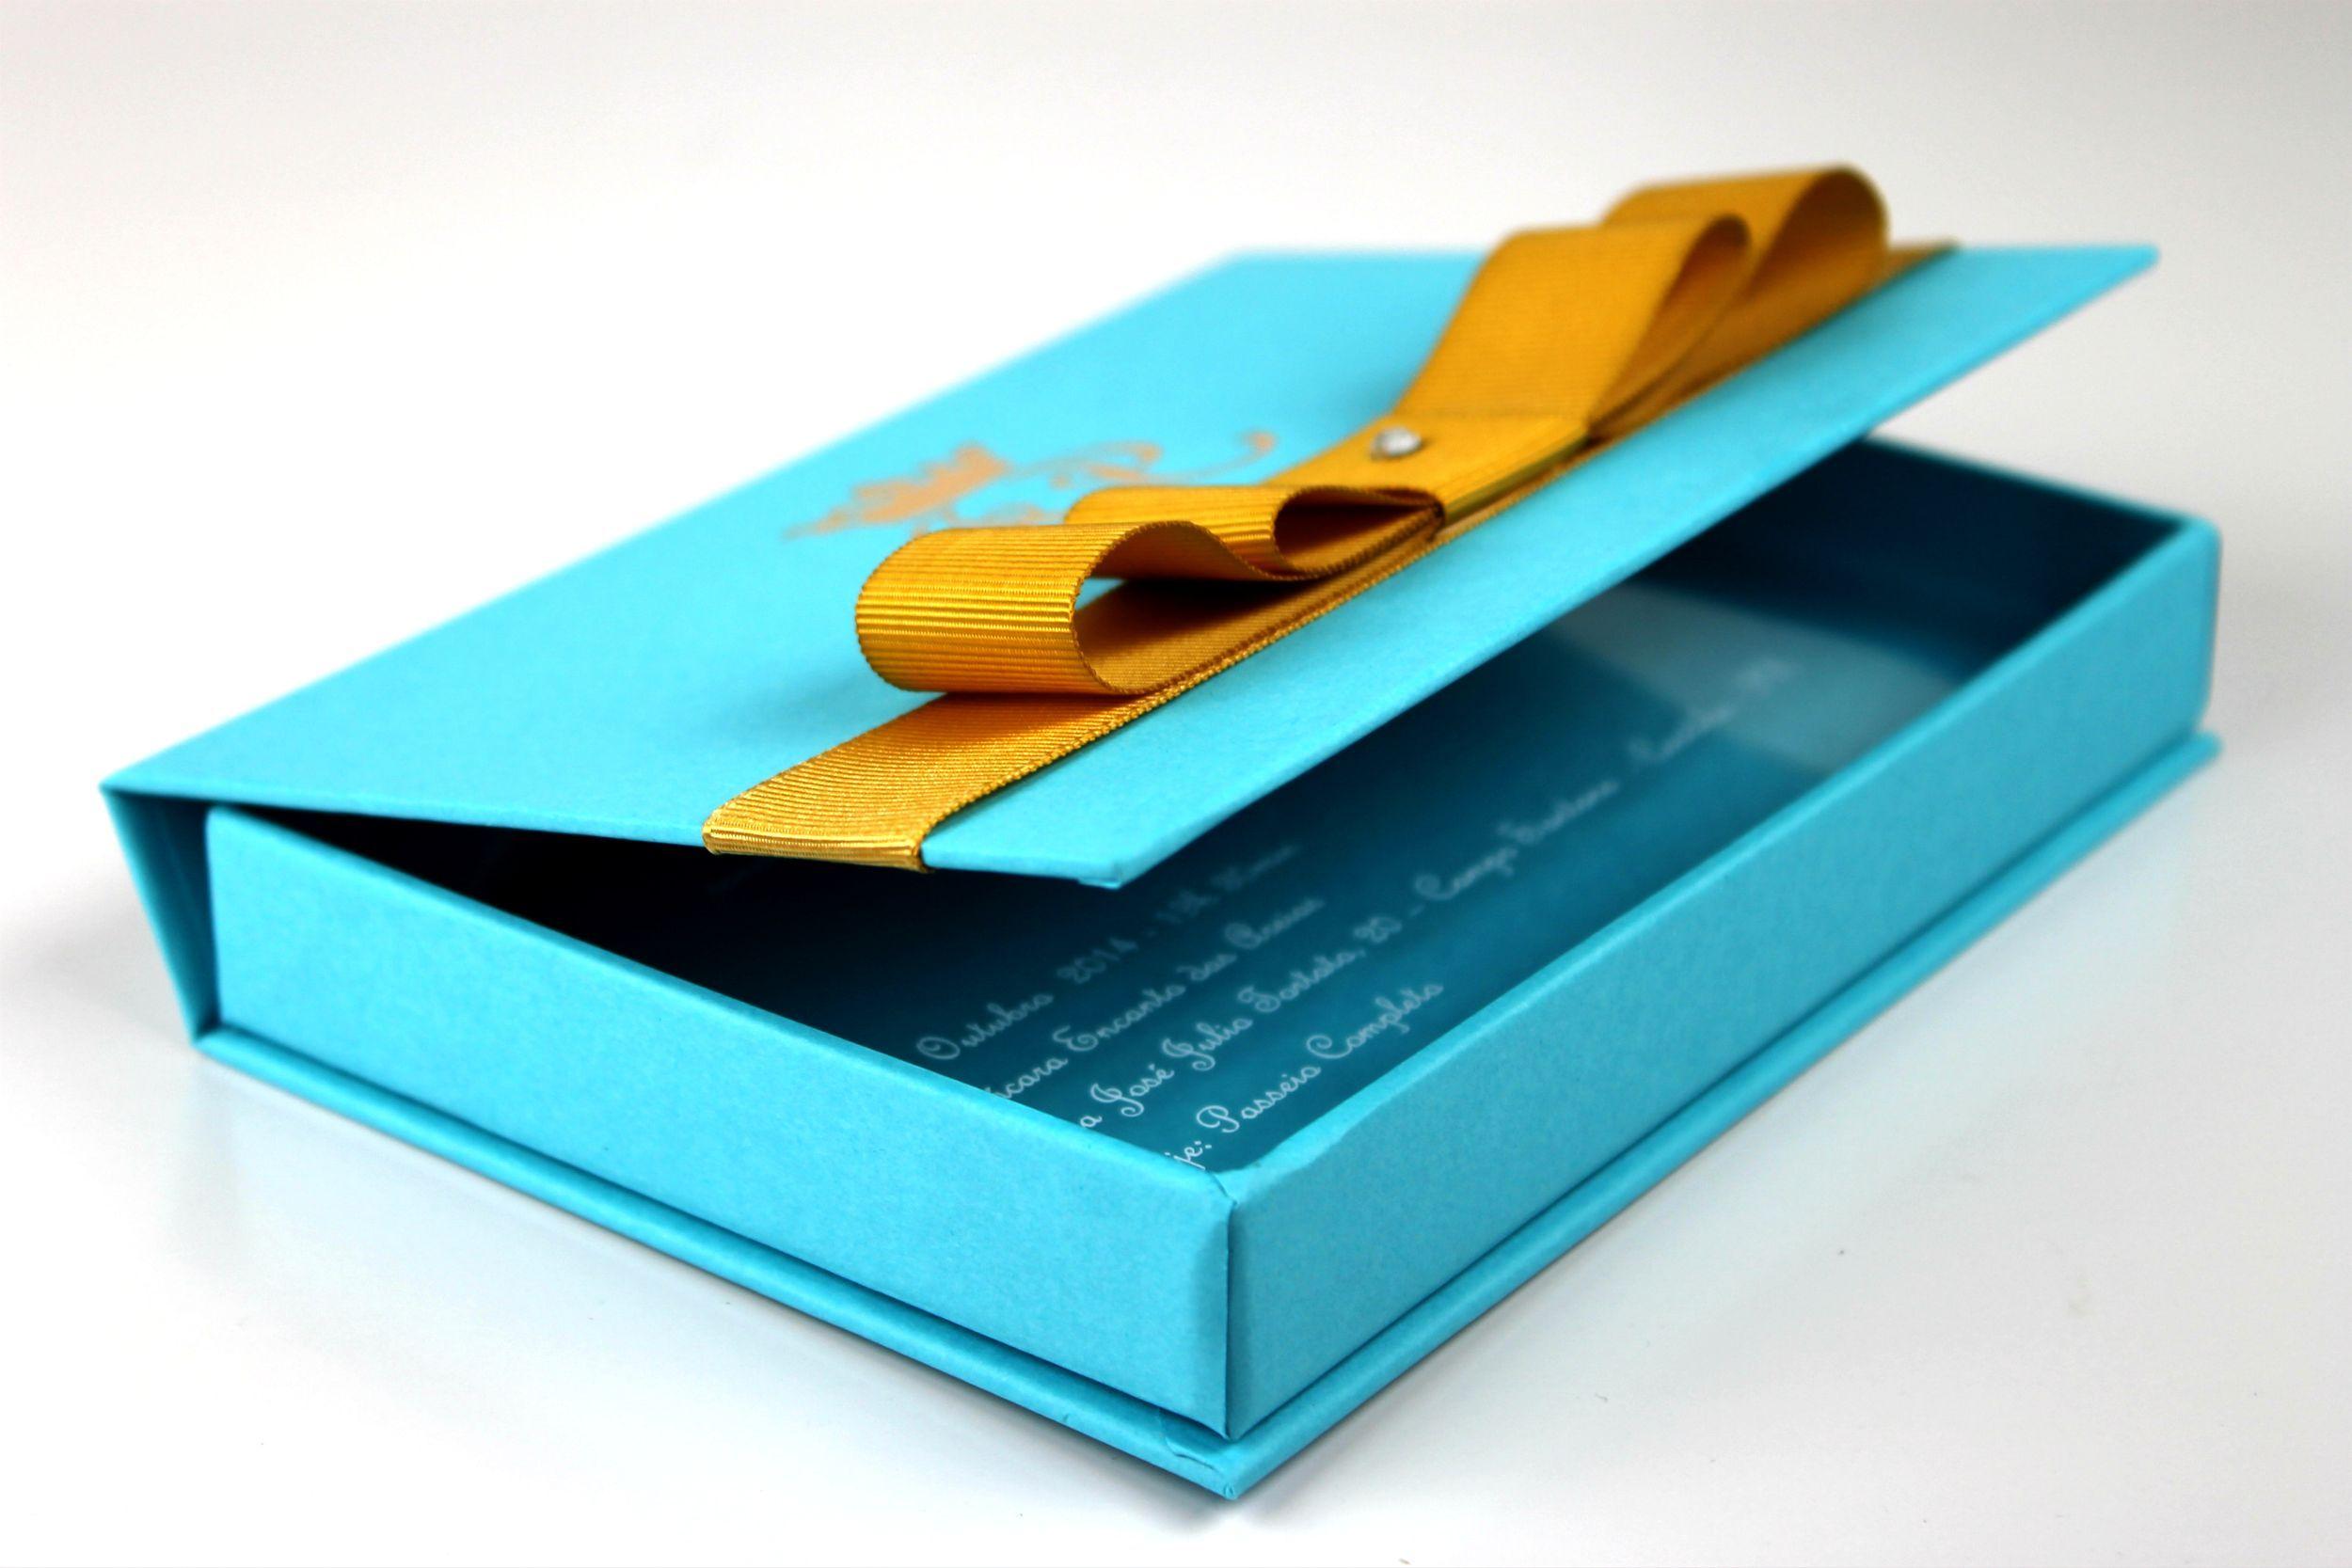 CriativeBox / Projeto especial de convite Box   #criativebox #convitebox #convite